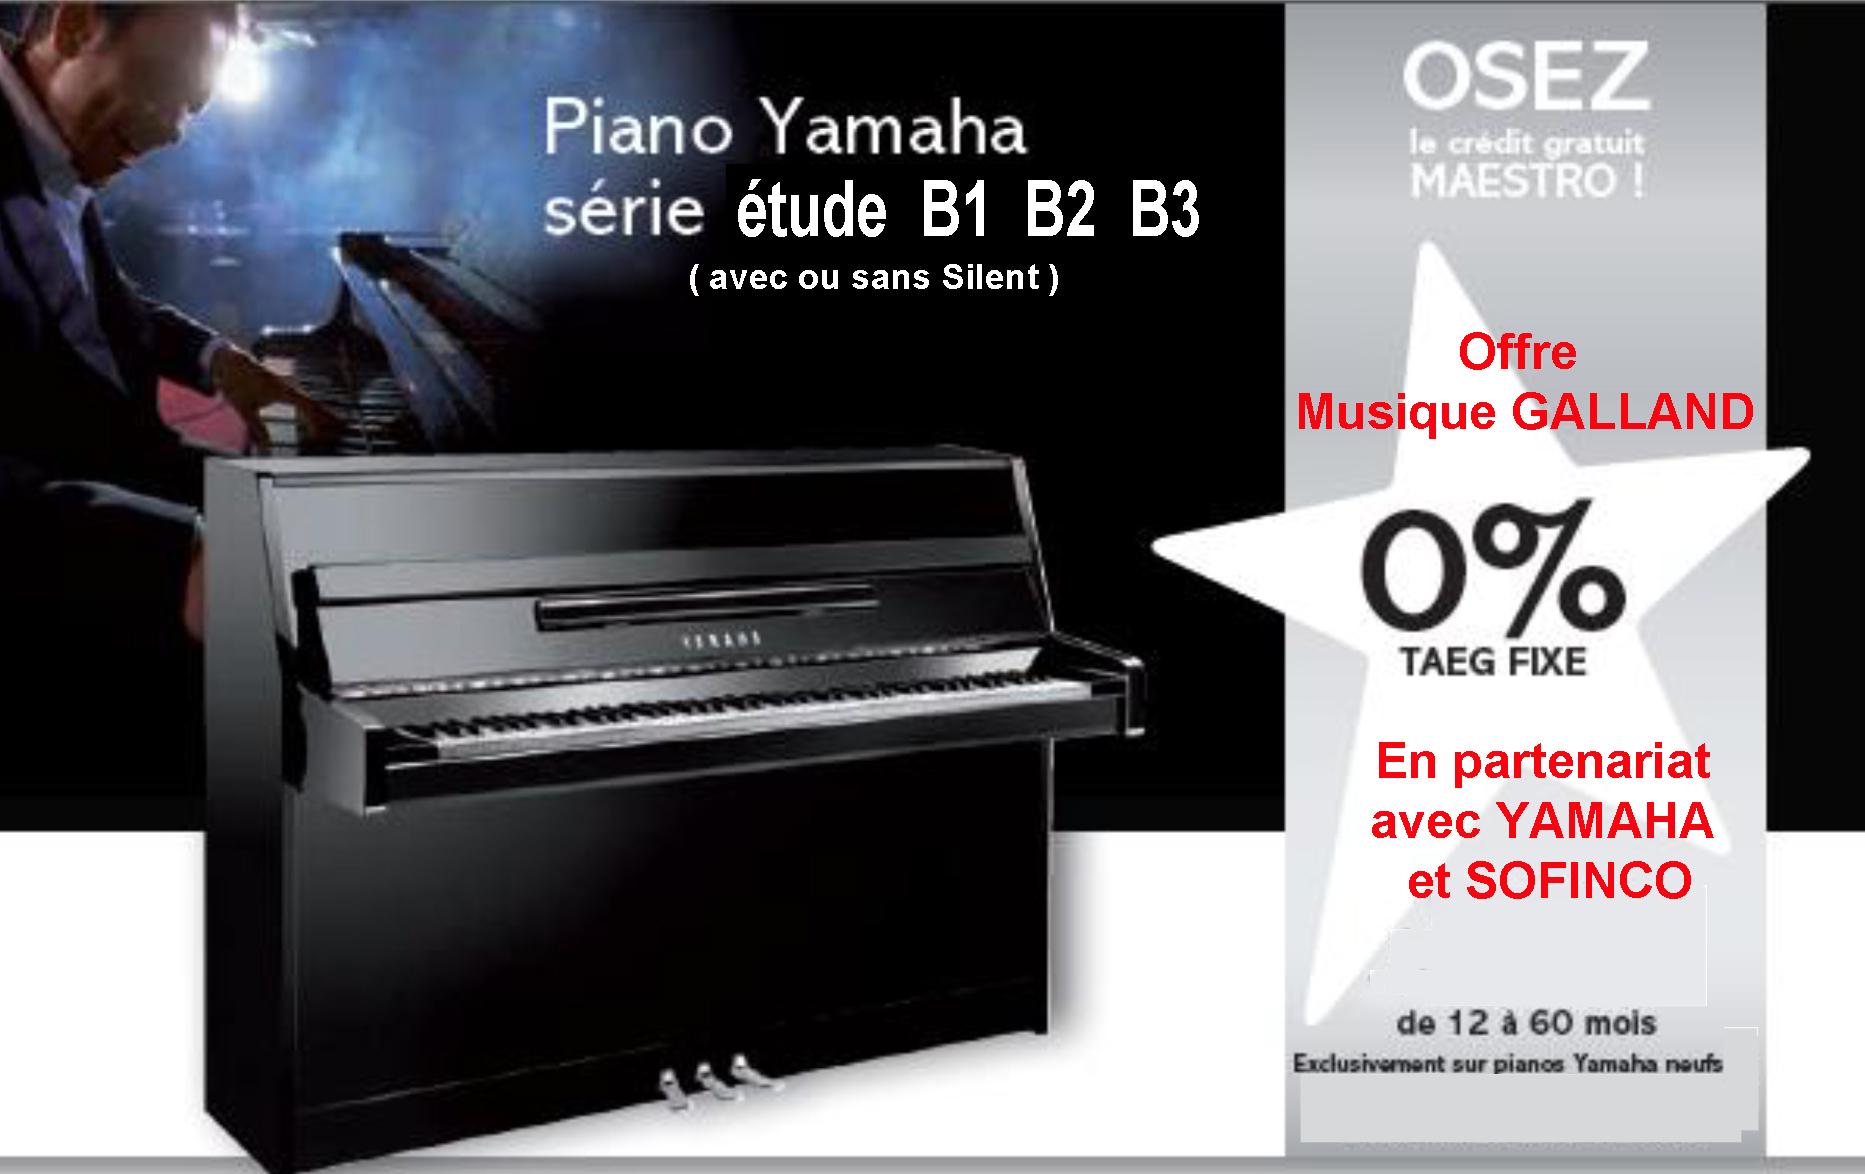 Credit gratuit piano